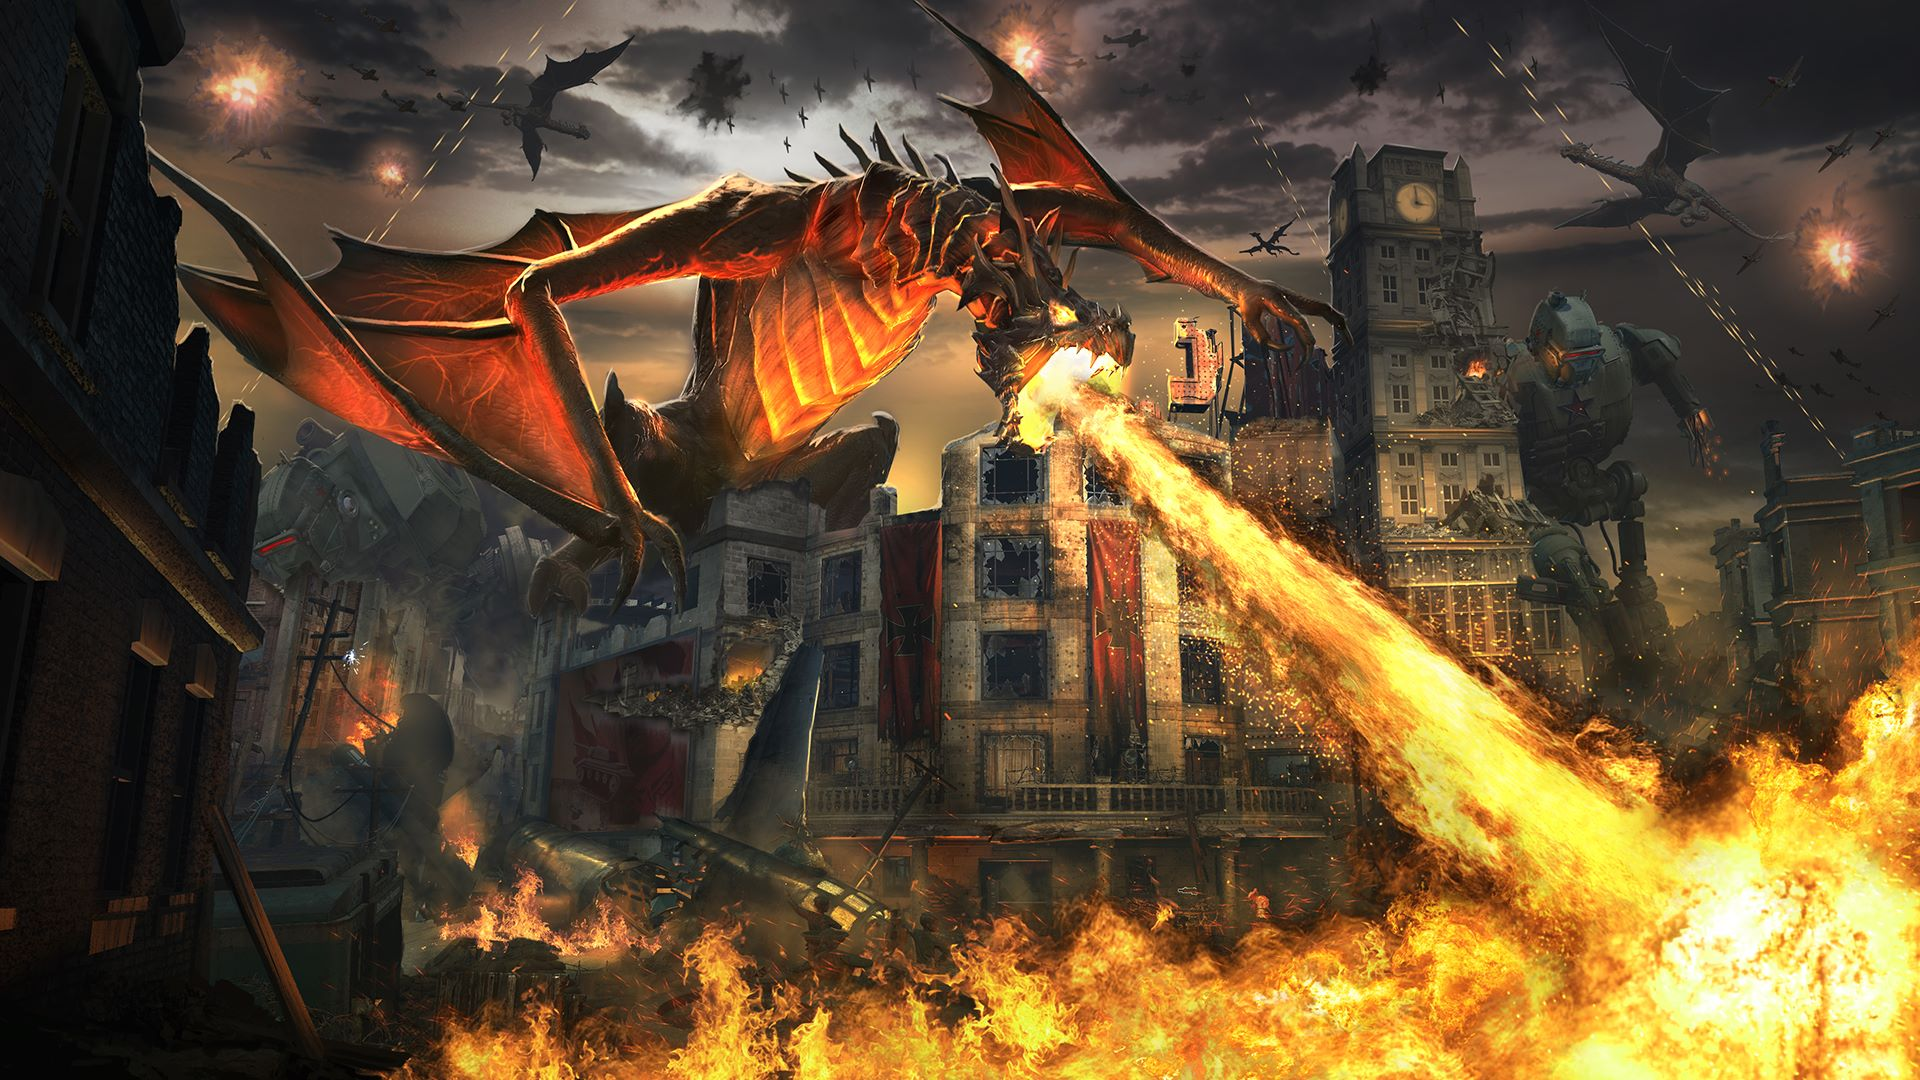 Call Of Duty Black Ops Iii Gorod Krovi Zombies Map Kaufen